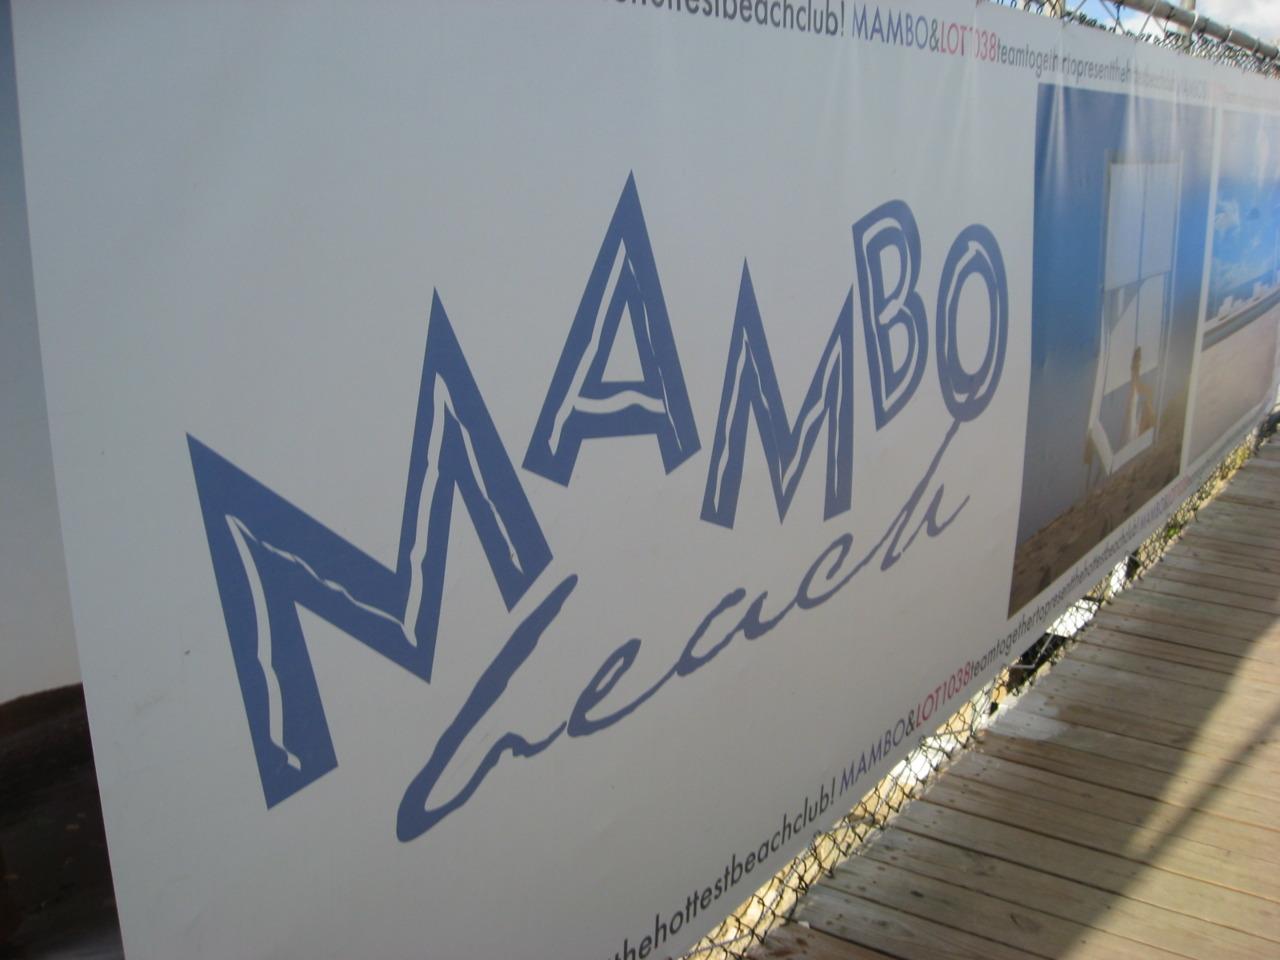 beaches of Curacao, Mambo beach sign